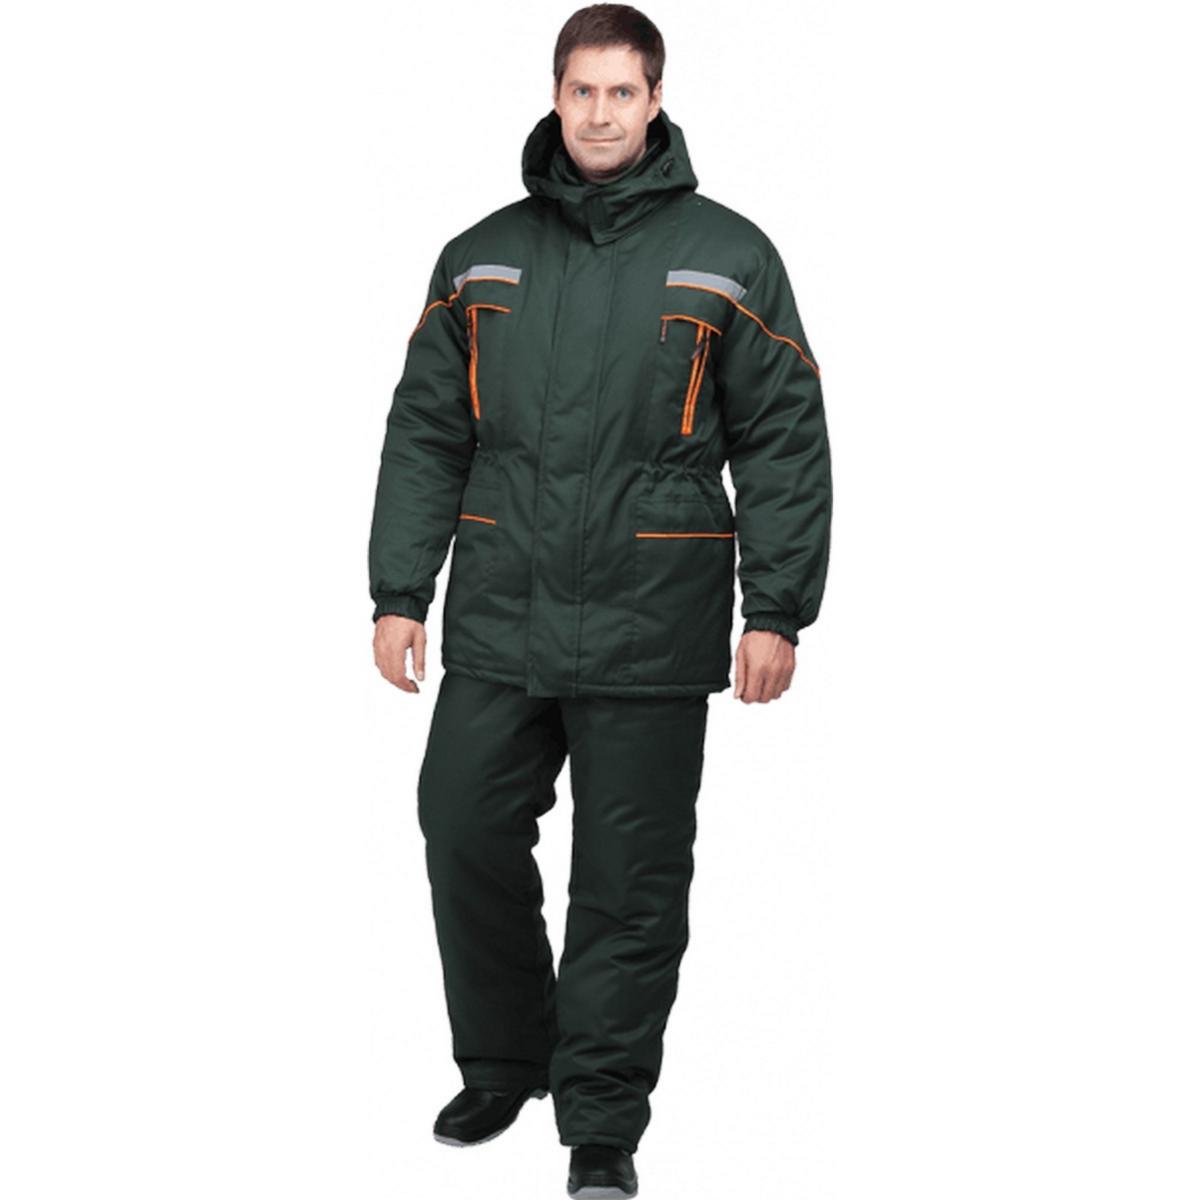 Куртка ЛАНДШАФТ утепленная зеленый (разм. 104-108 рост 182-188)